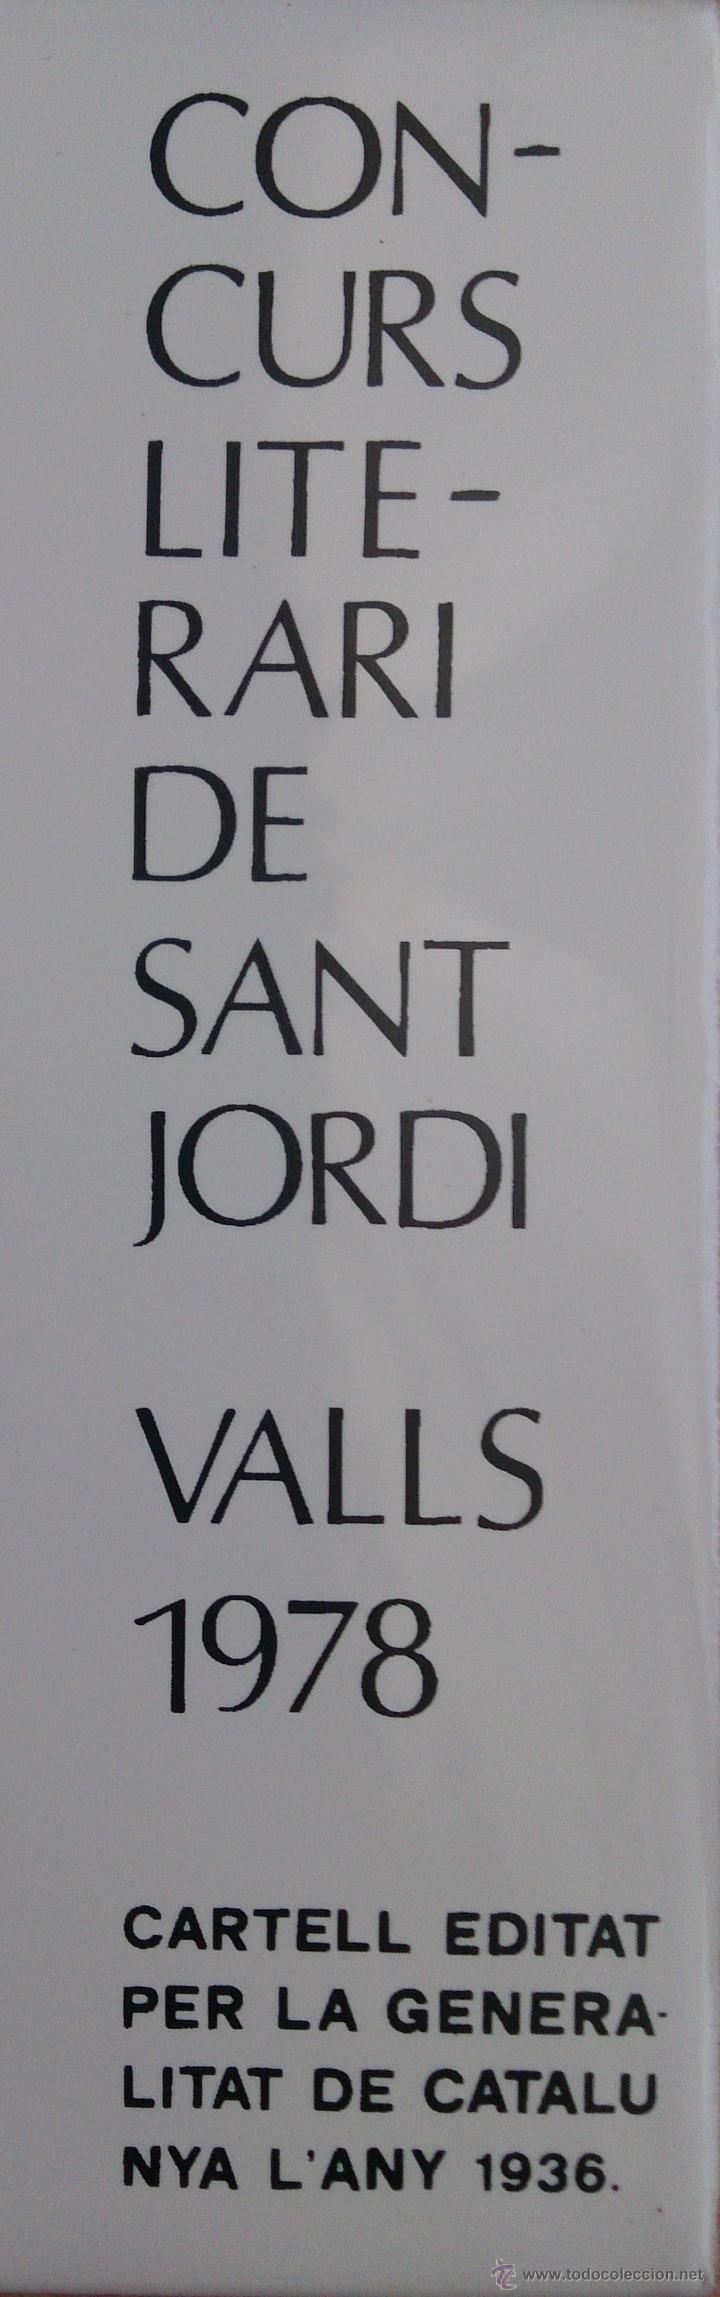 Antigüedades: Antiguo azulejo ( ESCOLA NOVA POBLÉ LLIURE ), concurso literario de Sant Jordi 1978, cartel de 1936 - Foto 4 - 43848071